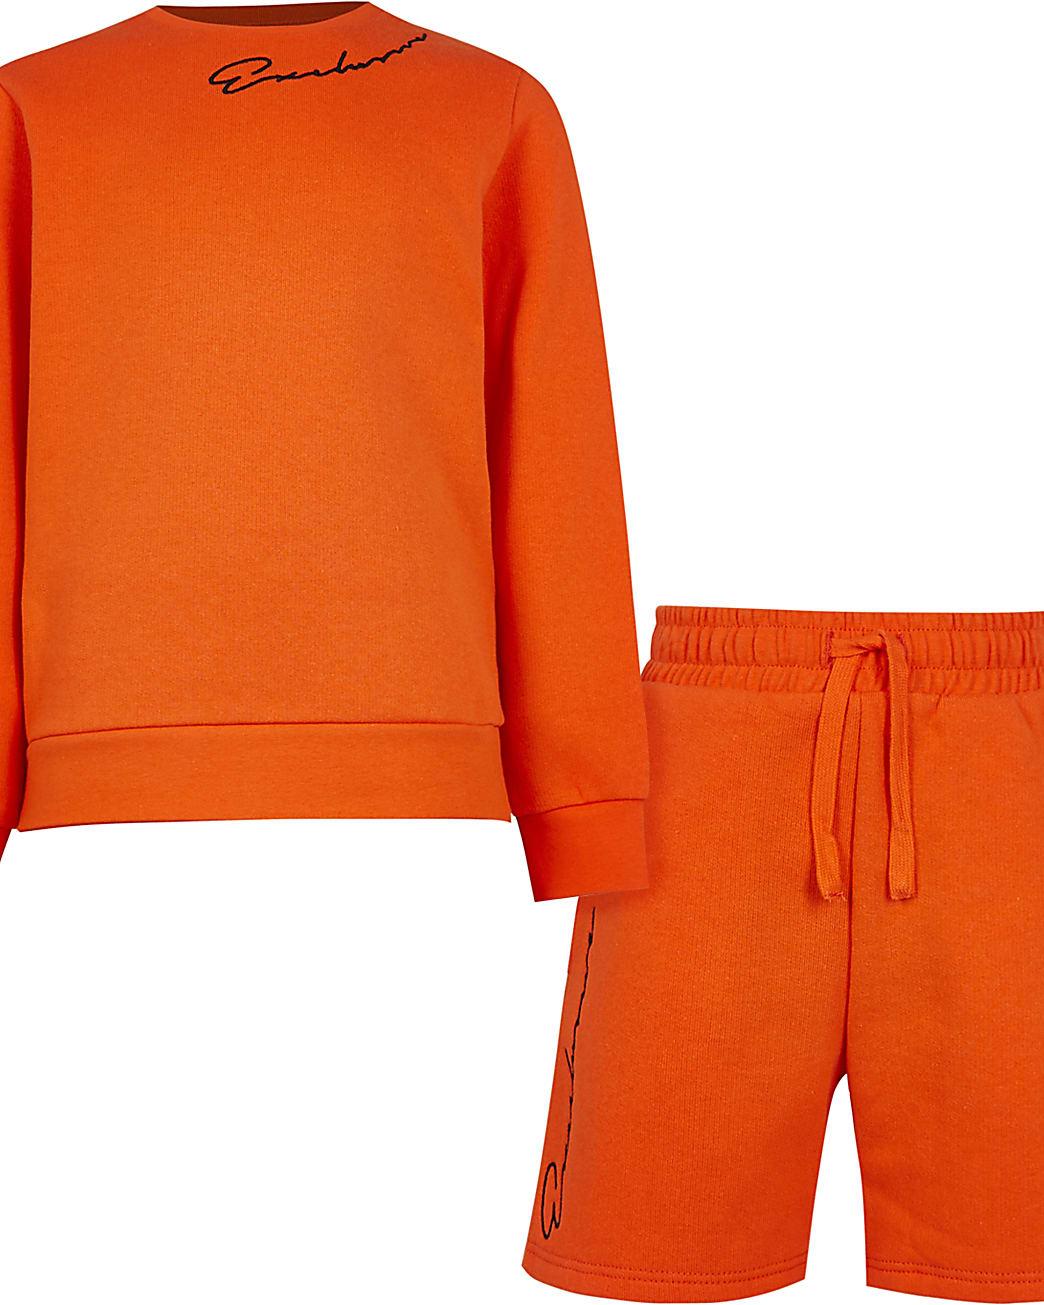 Boys orange 'Exclusive' sweatshirt outfit